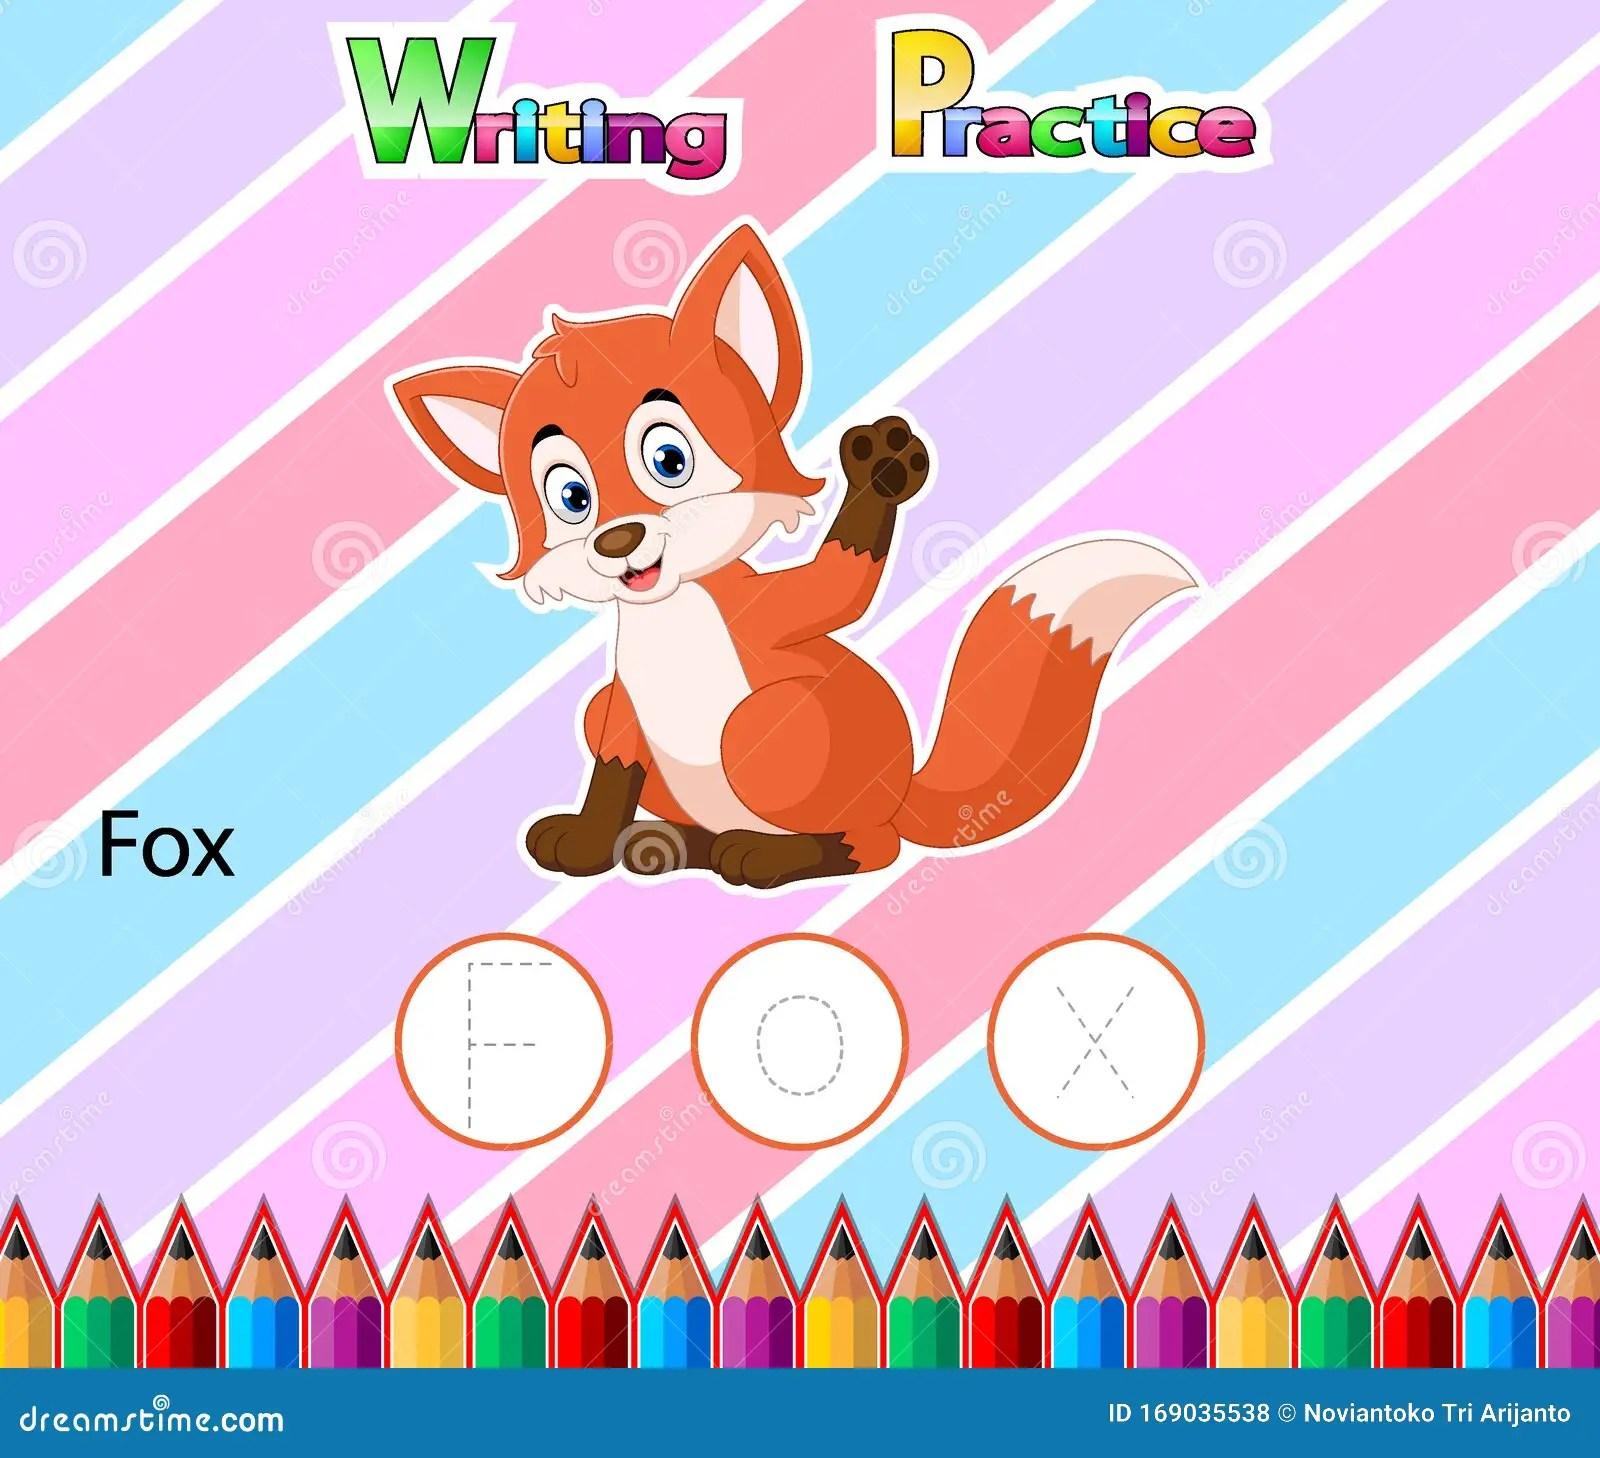 Worksheet Writing Practice Alphabet F For Fox Stock Vector